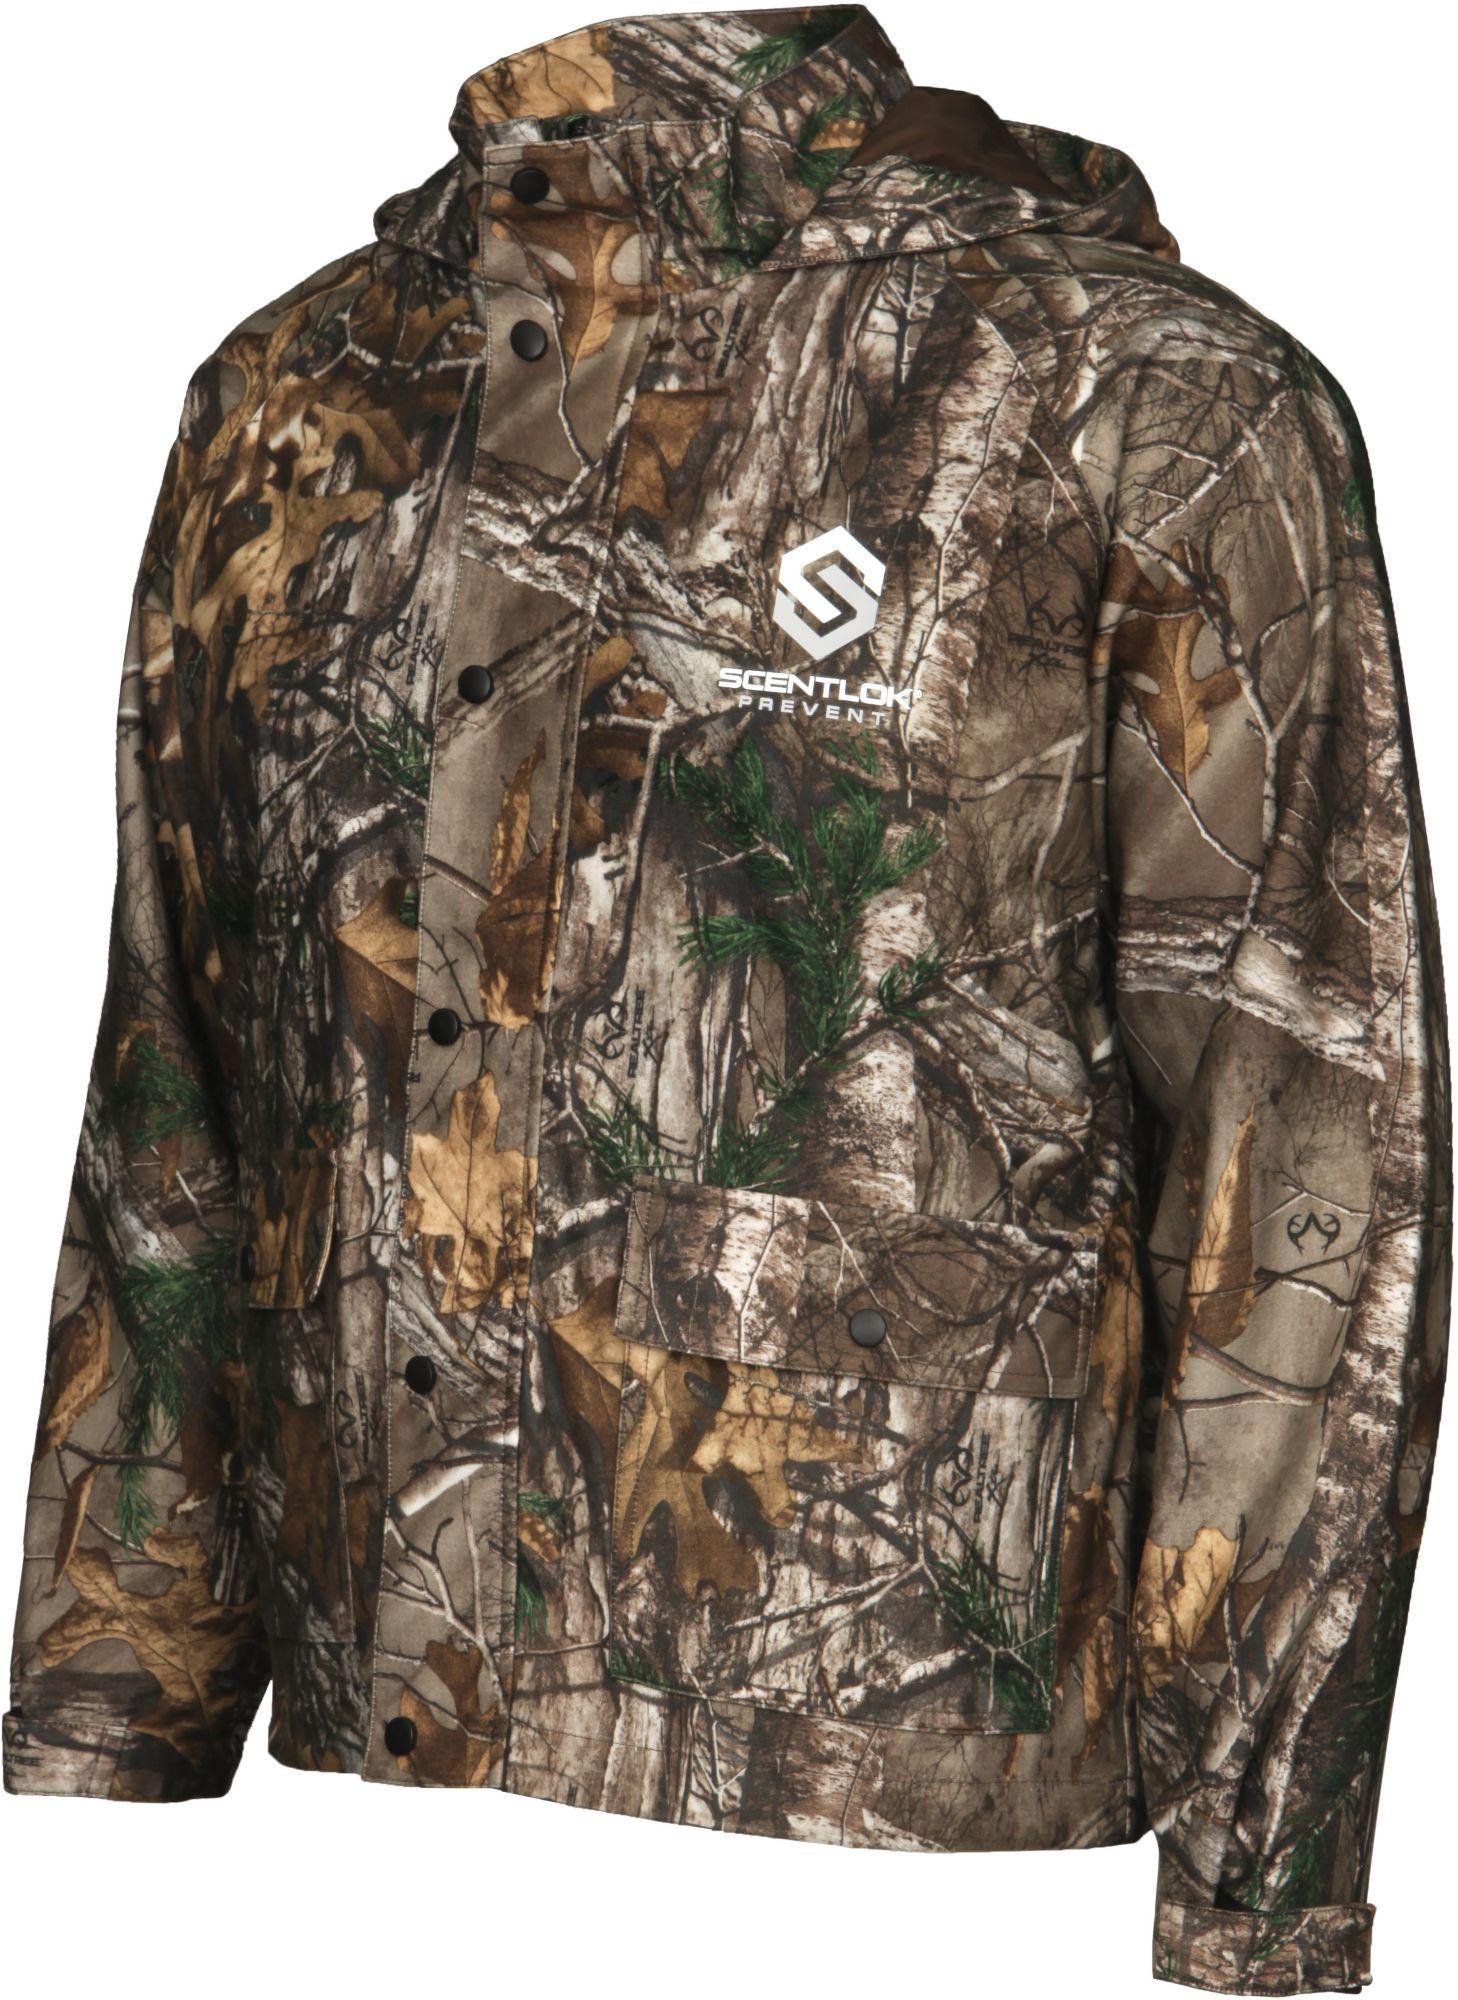 ScentLok Men's Prevent Waterproof Hunting Jacket, Size: Medium, Brown thumbnail